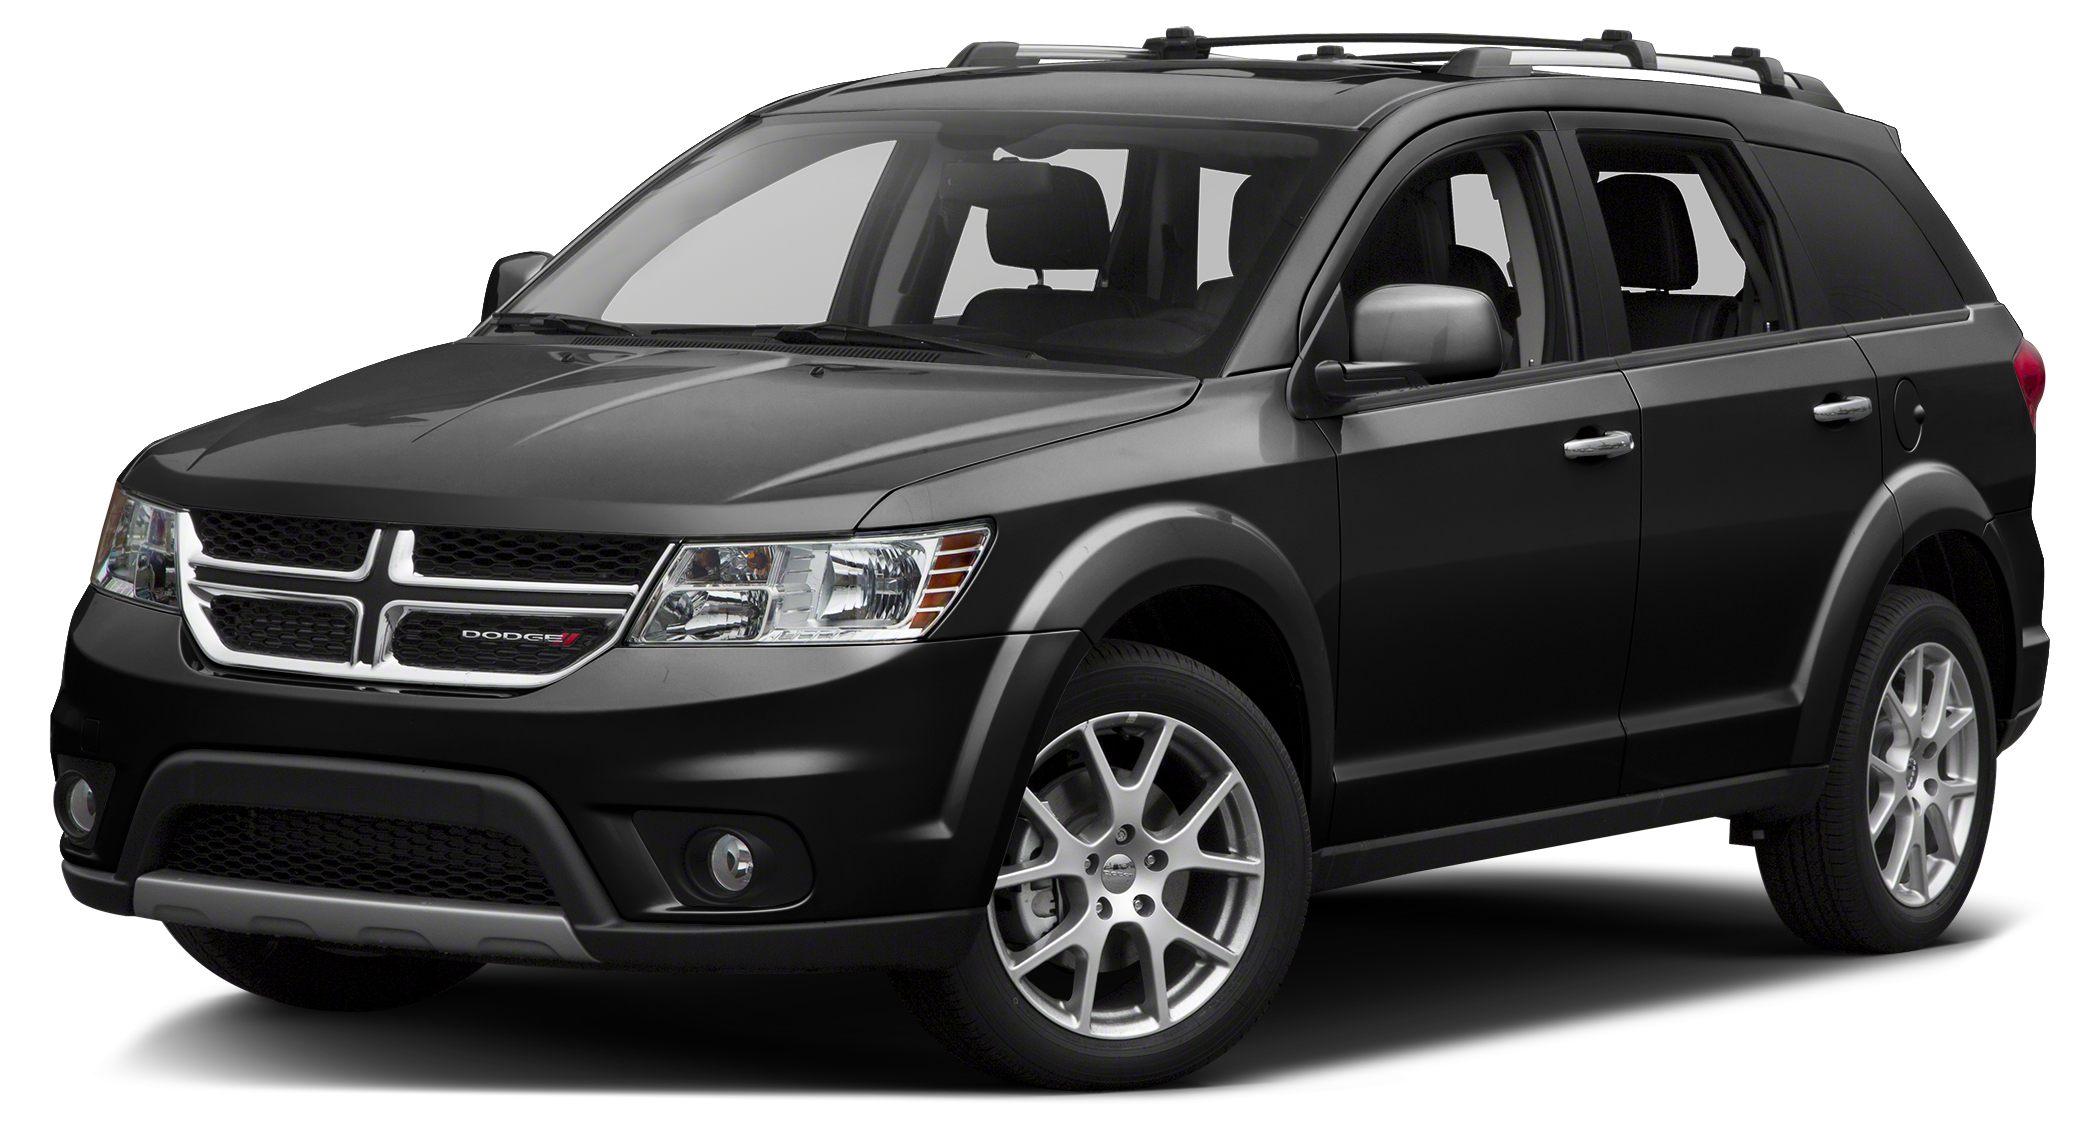 2016 Dodge Journey RT Miles 0Color Black Clearcoat Stock D3302 VIN 3C4PDDEG9GT168541